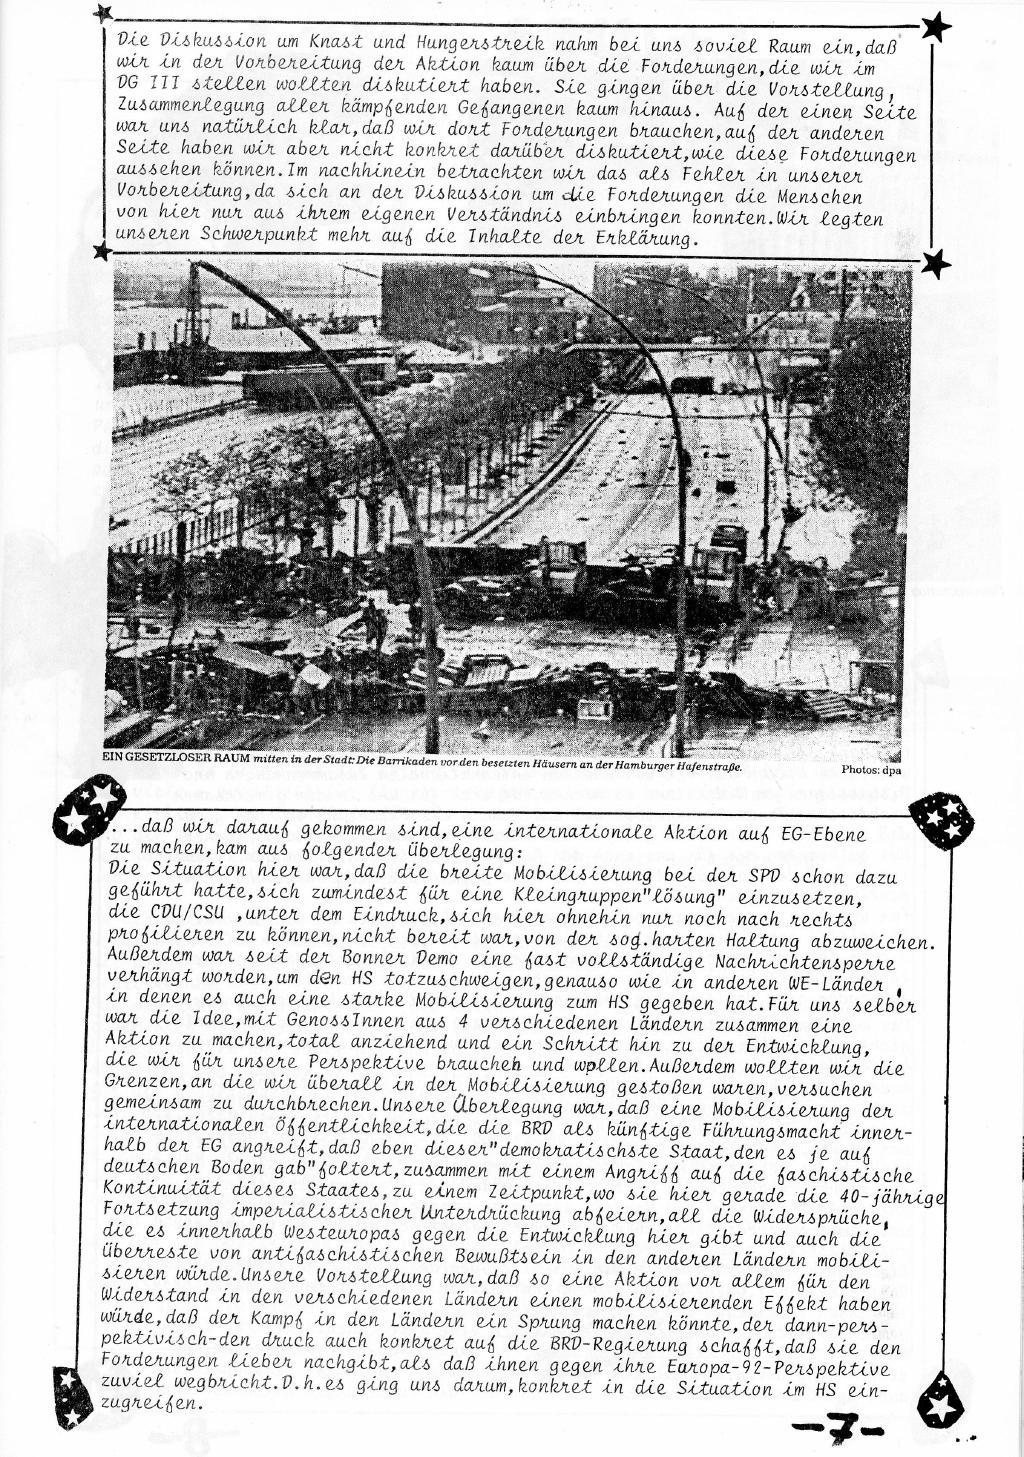 Belgien_Doku_Besetzung_EG_Kommission_1989_009